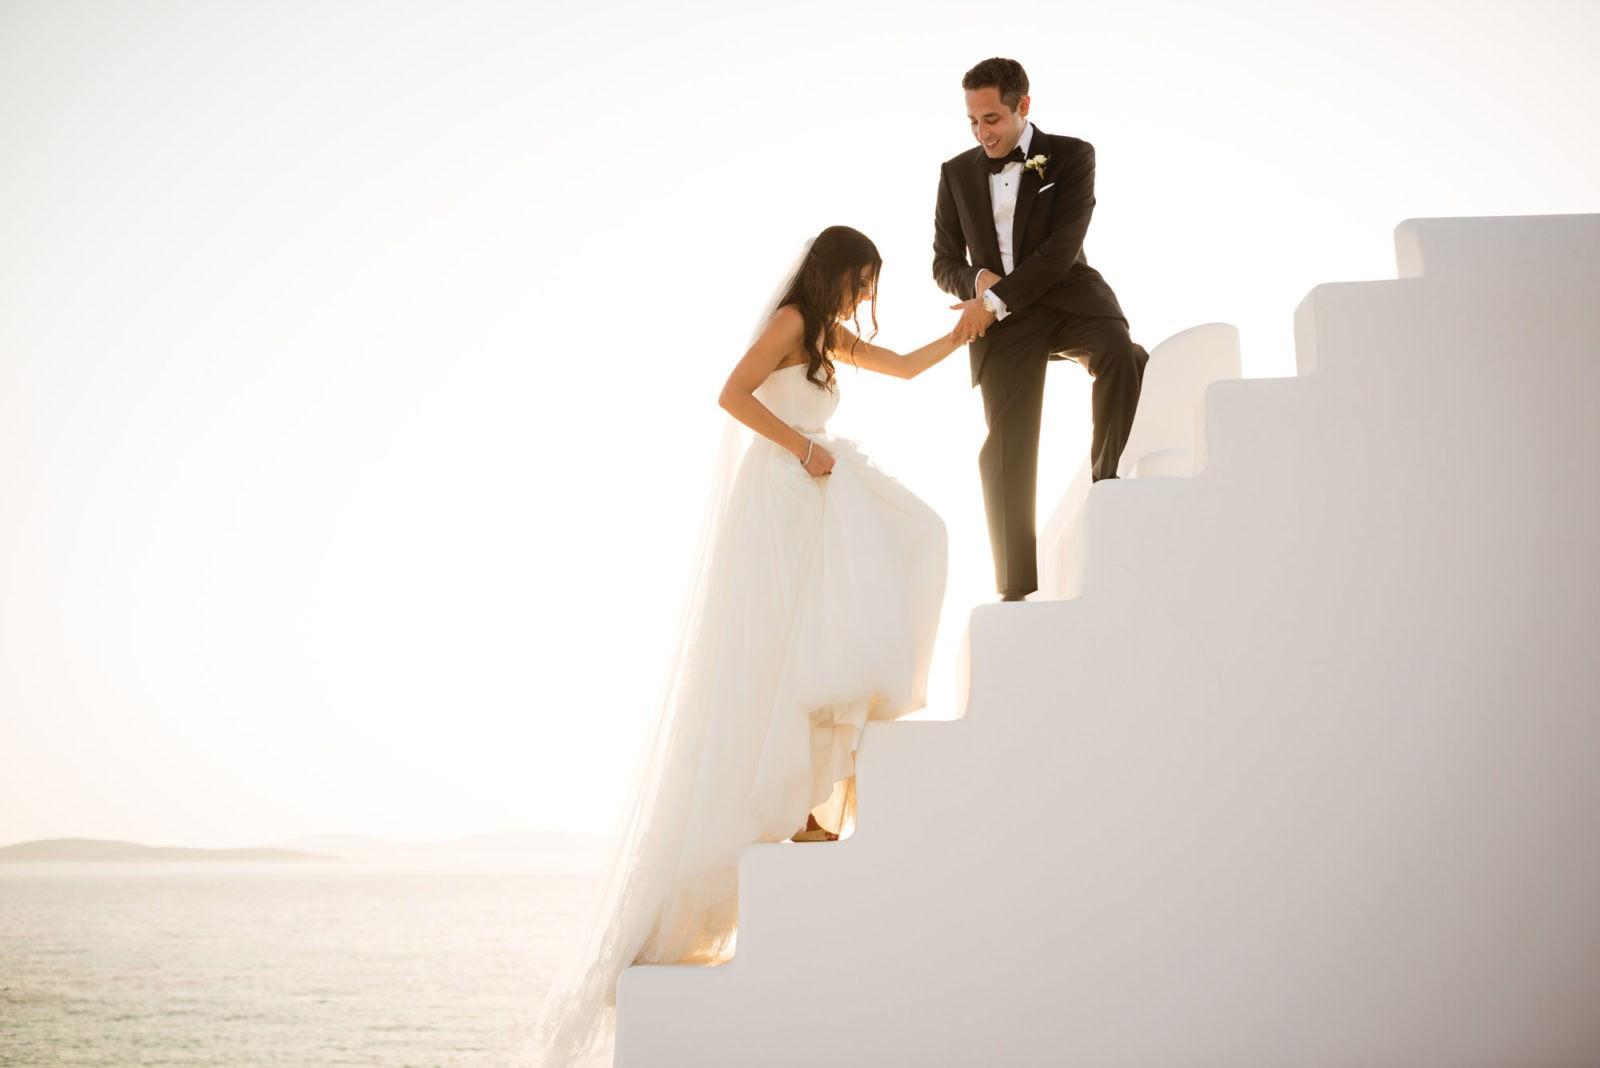 3fe8c79d525 Destination Wedding photographer in Greece - Nikos Psathoyiannakis